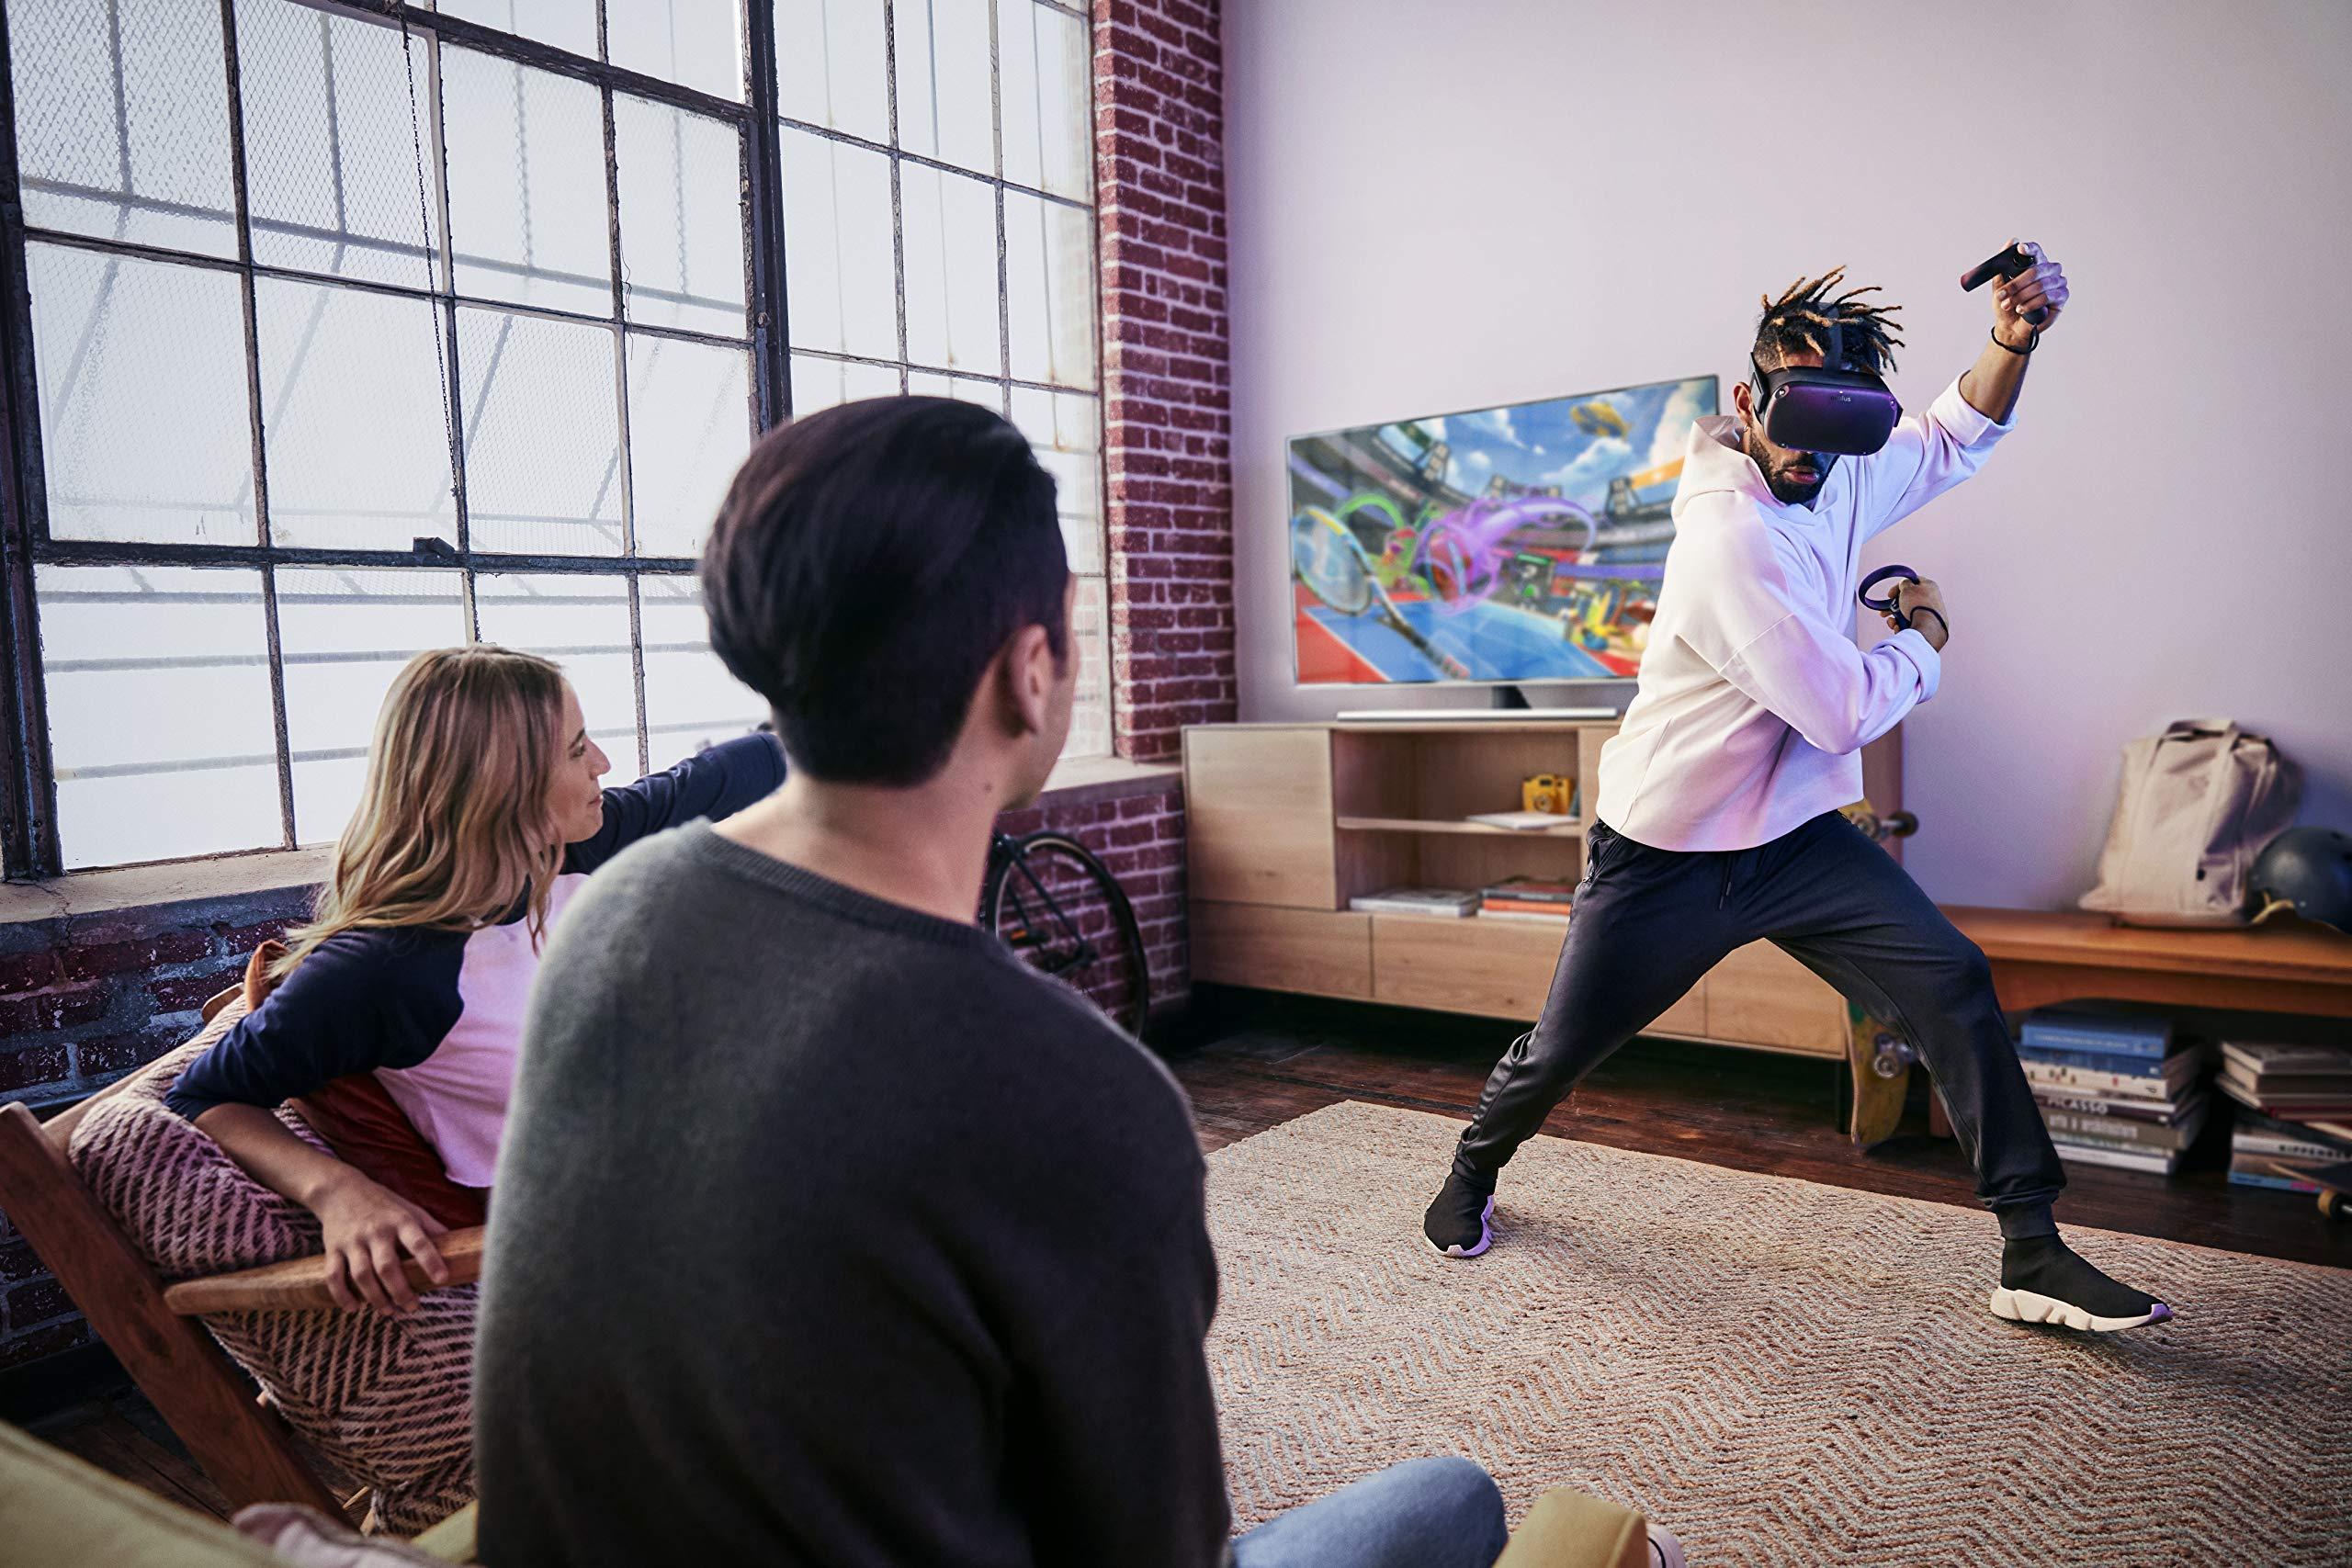 Oculus Quest on Amazon